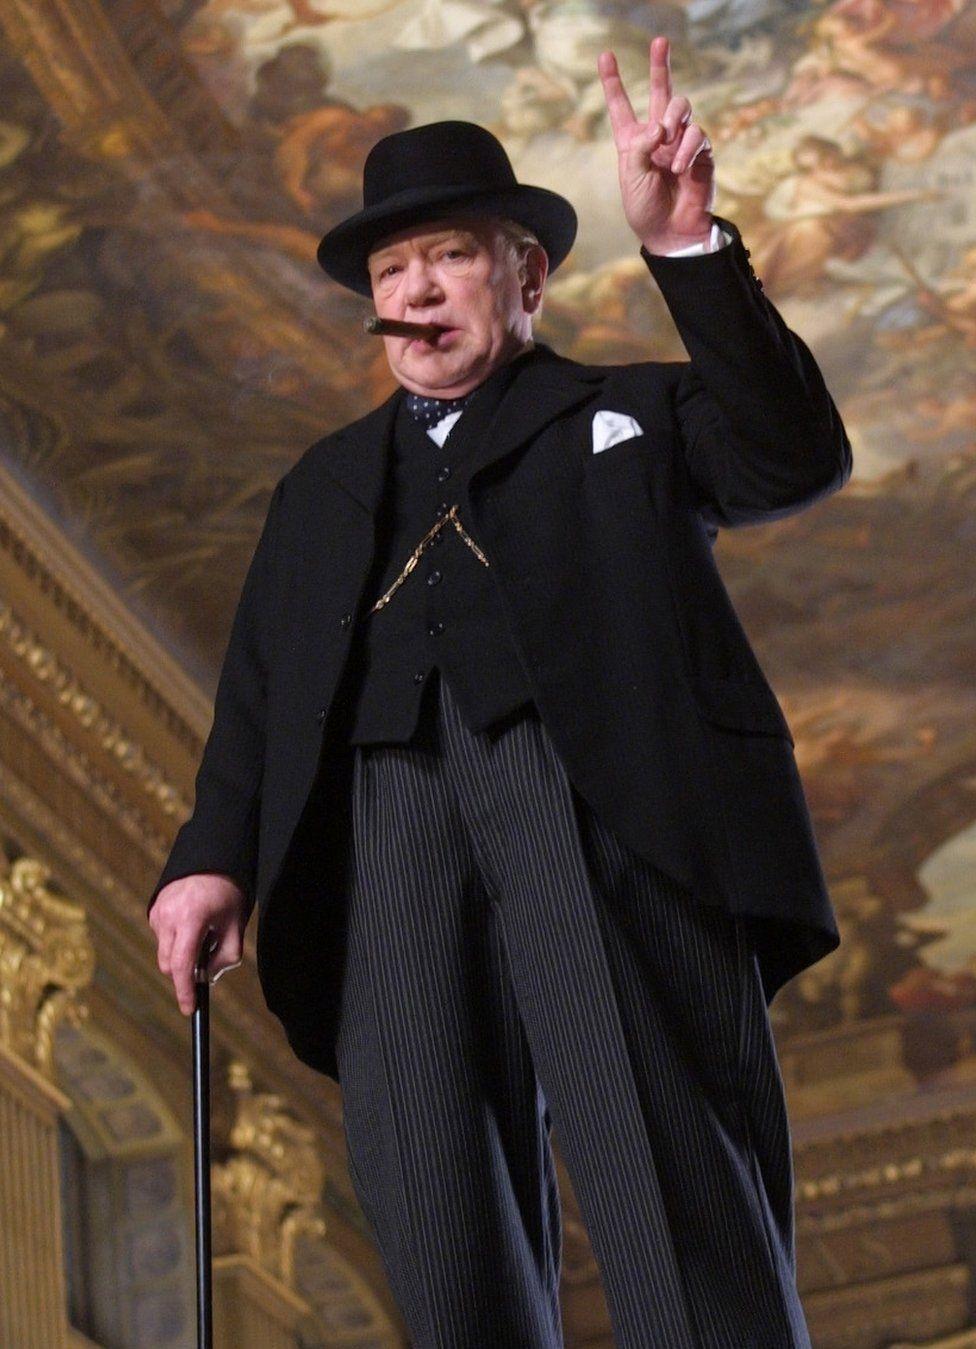 Albert Finney as Winston Churchill